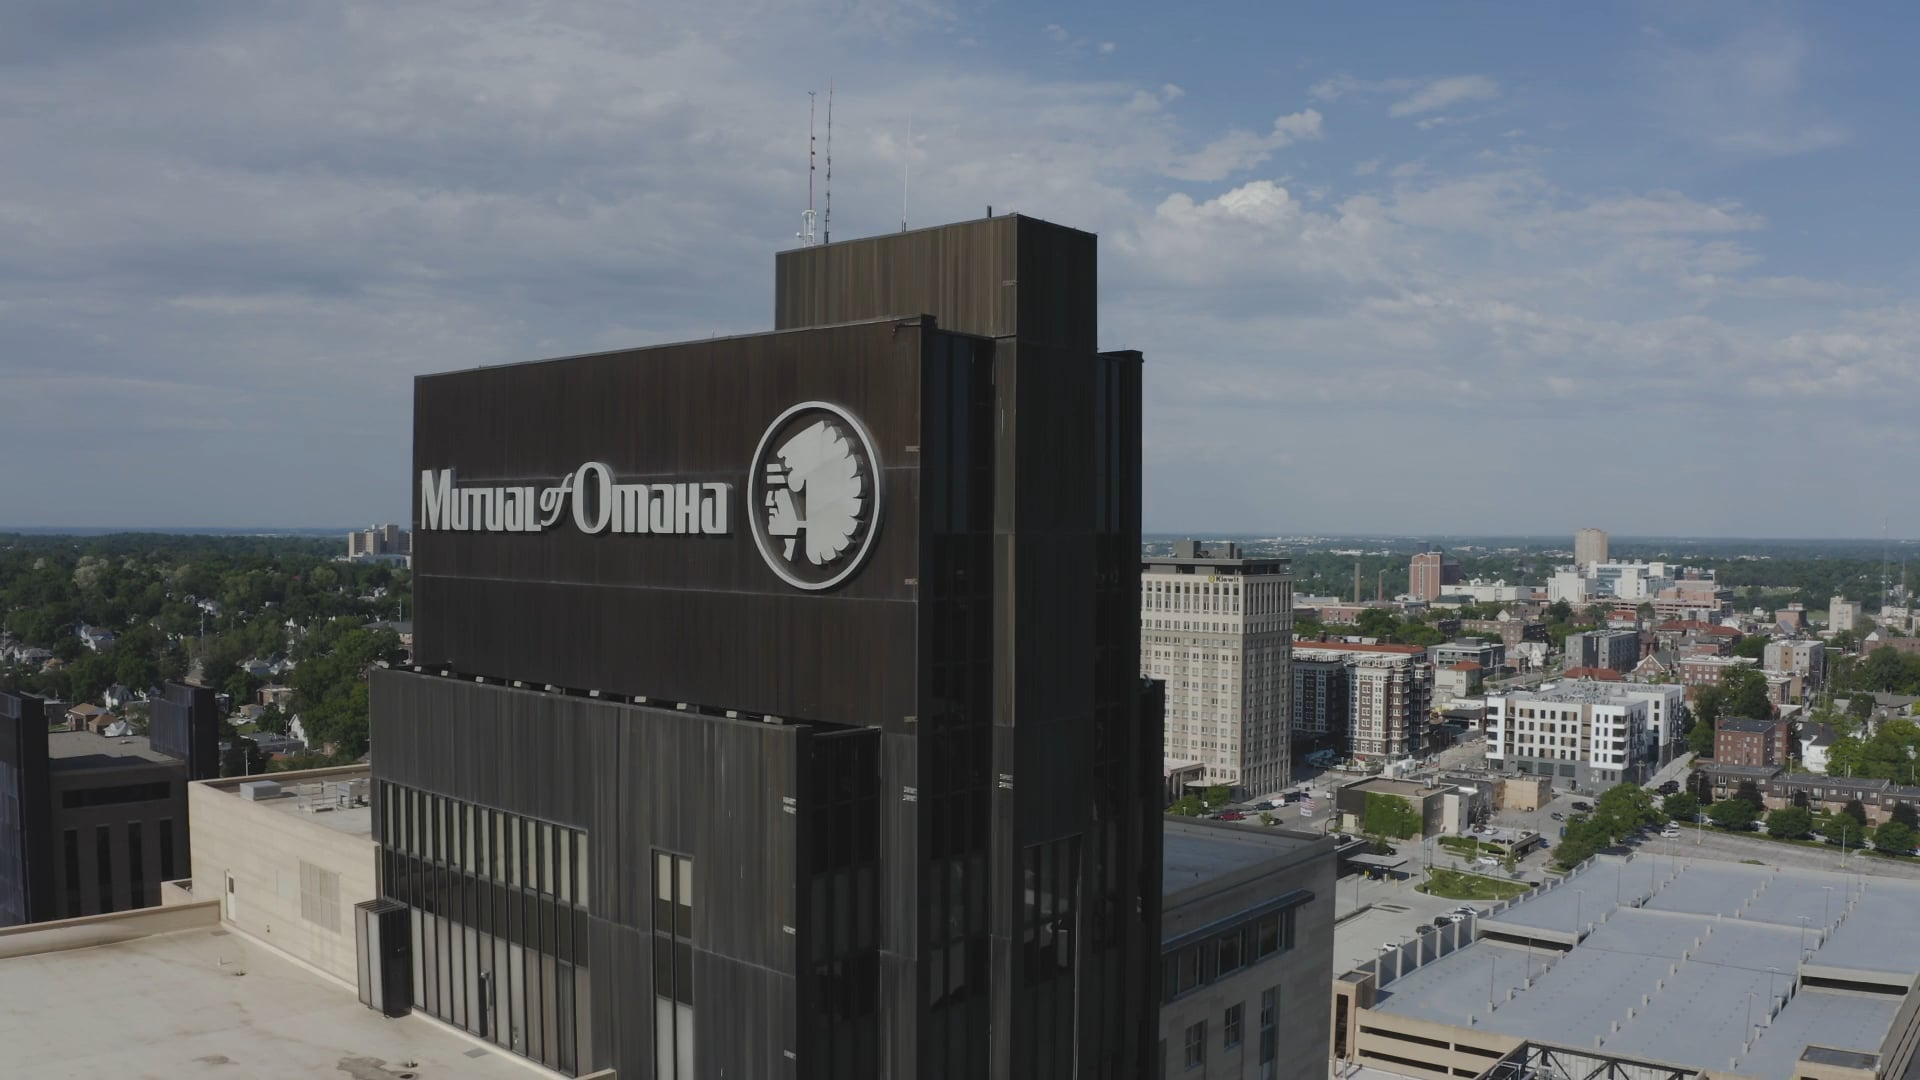 Mutual of Omaha Flag Raise